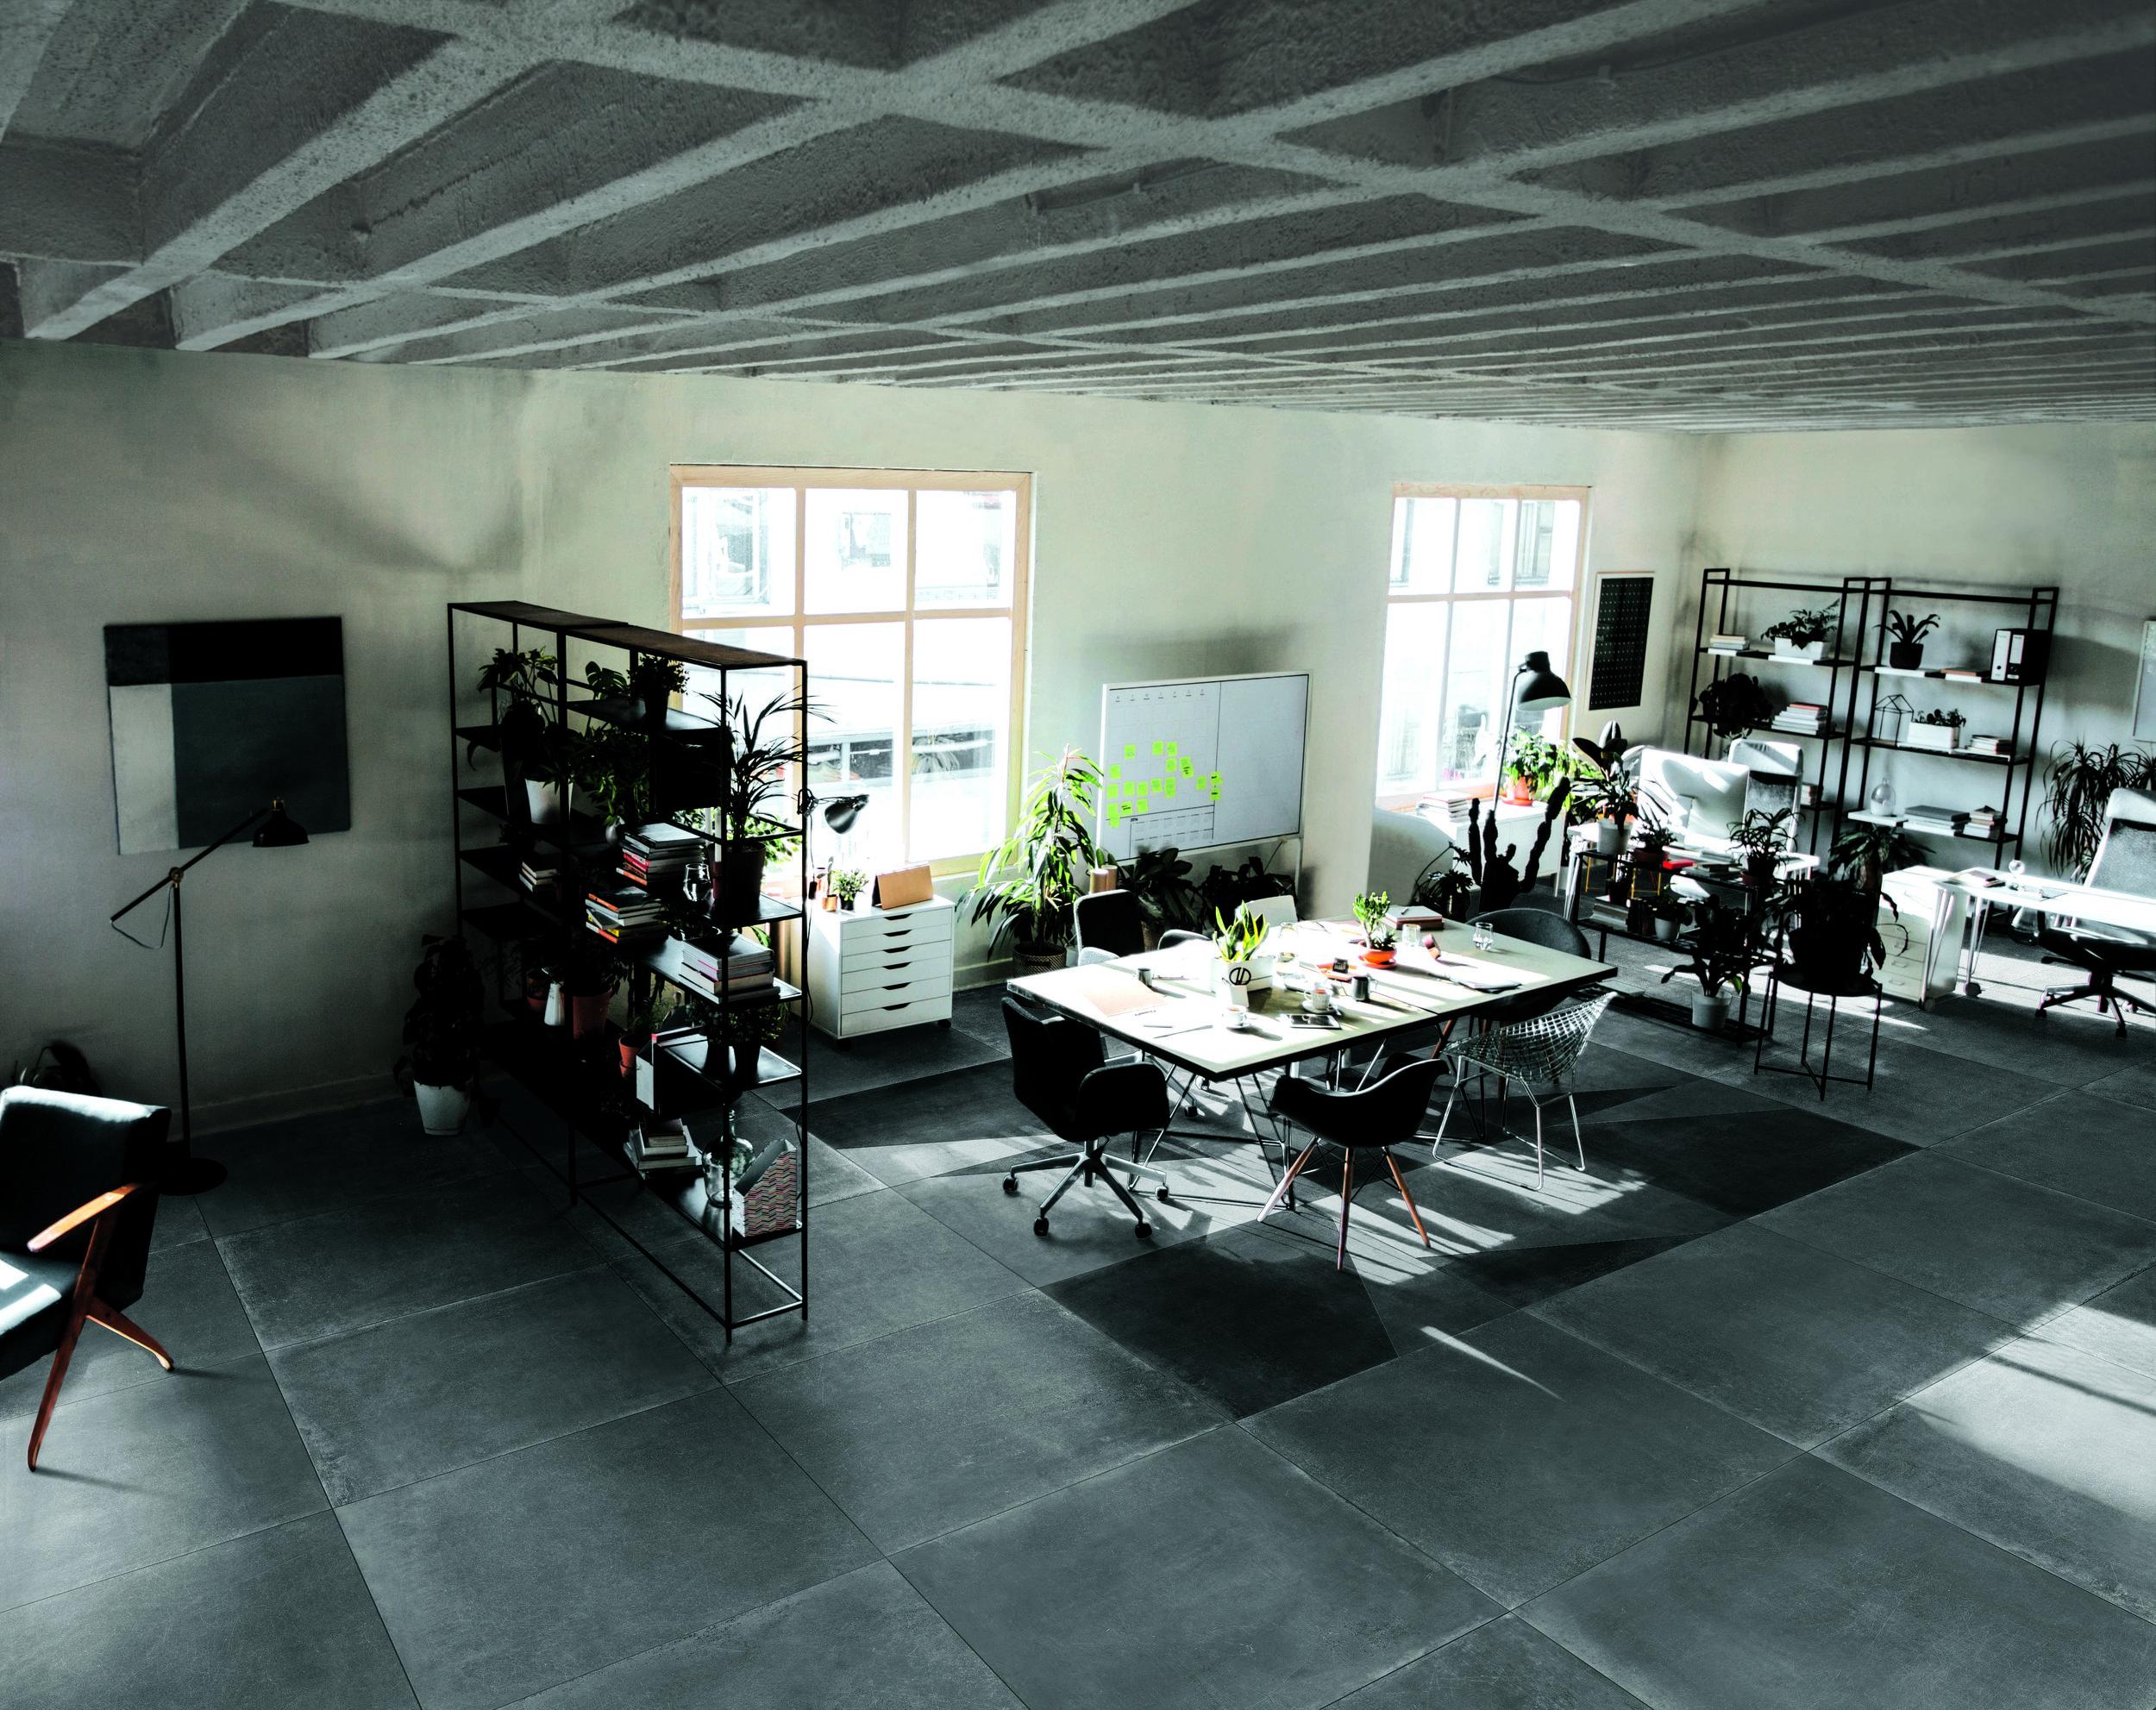 patina - inspiration gallery